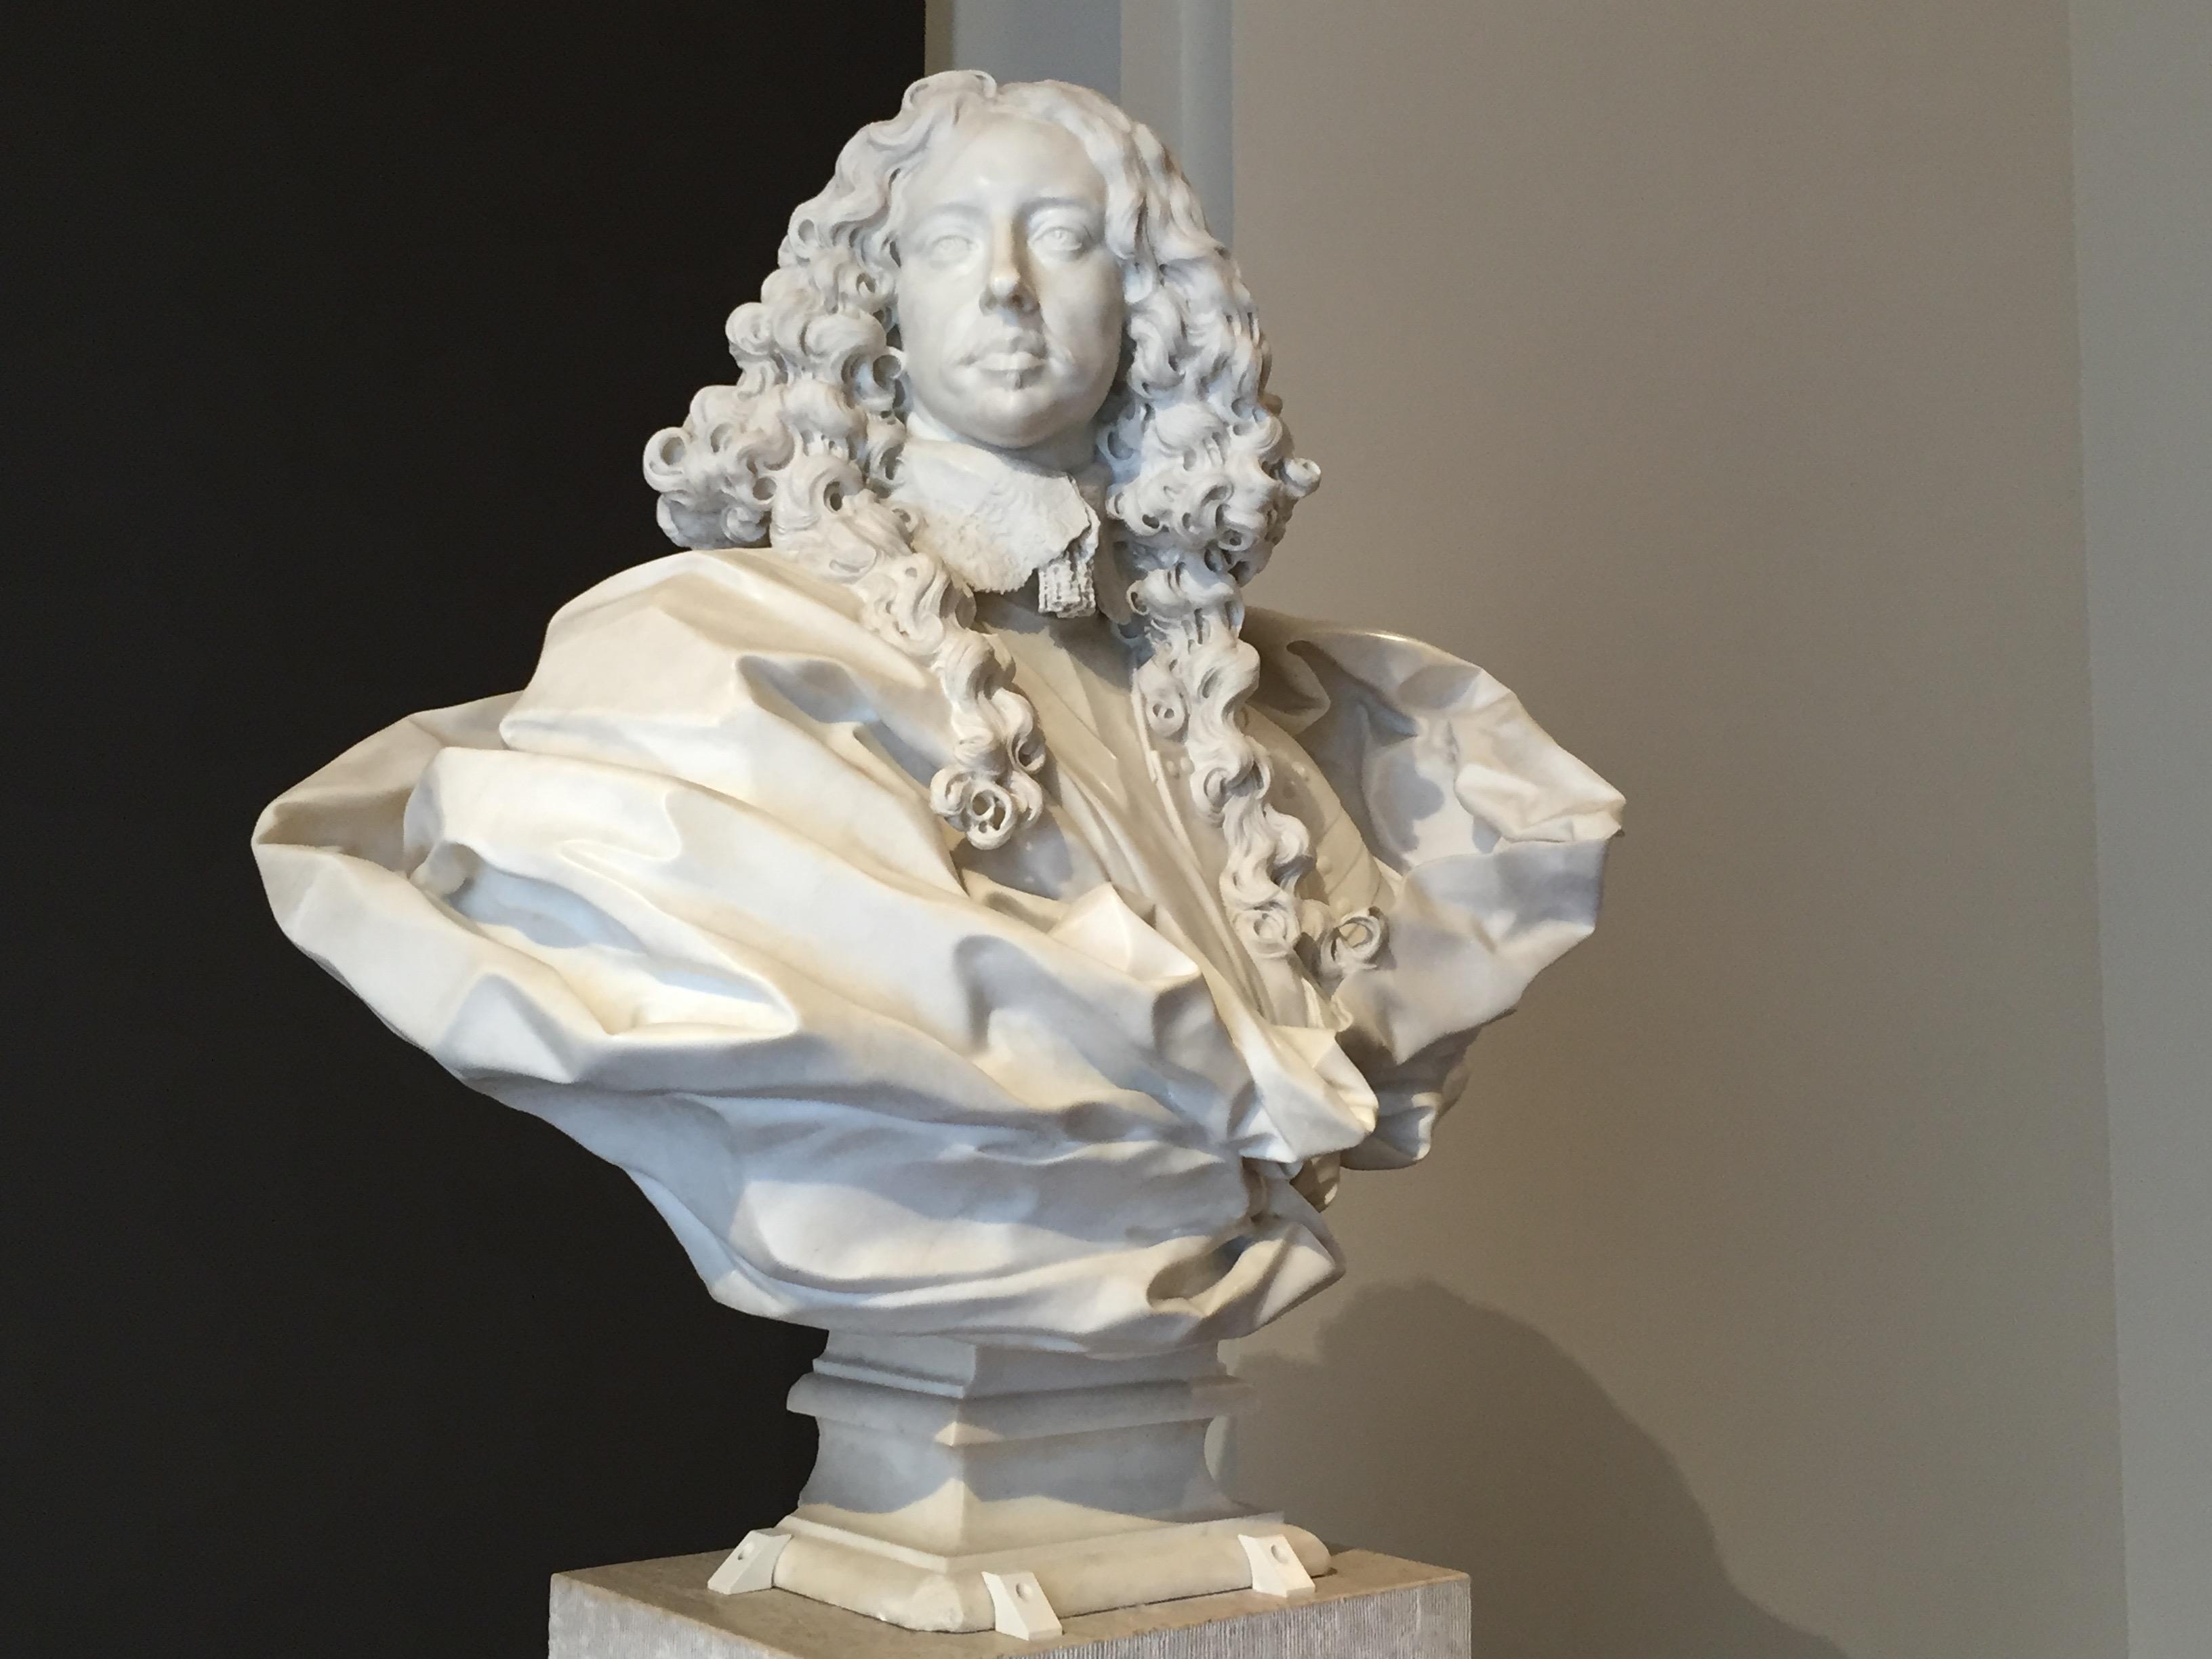 Gian Lorenzo Bernini: Busto del duque Francesco I d'Este, 1651. Galleria Estense, Módena.